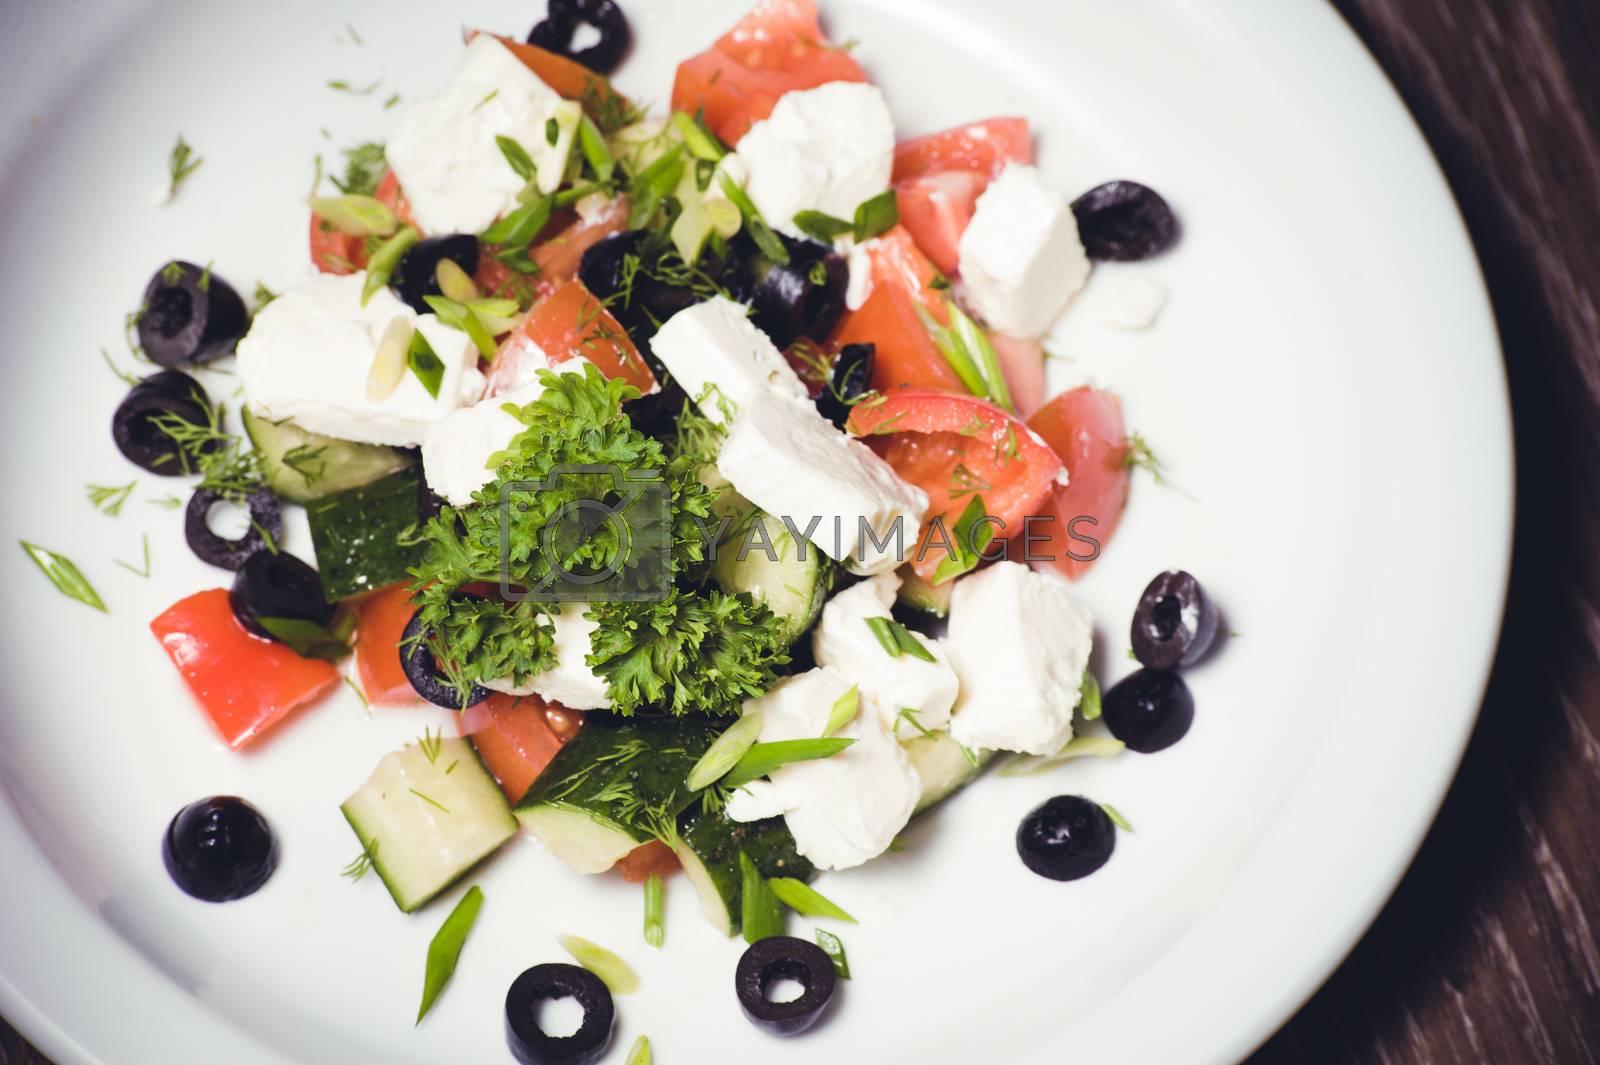 vegetarian greek salad served on white plate